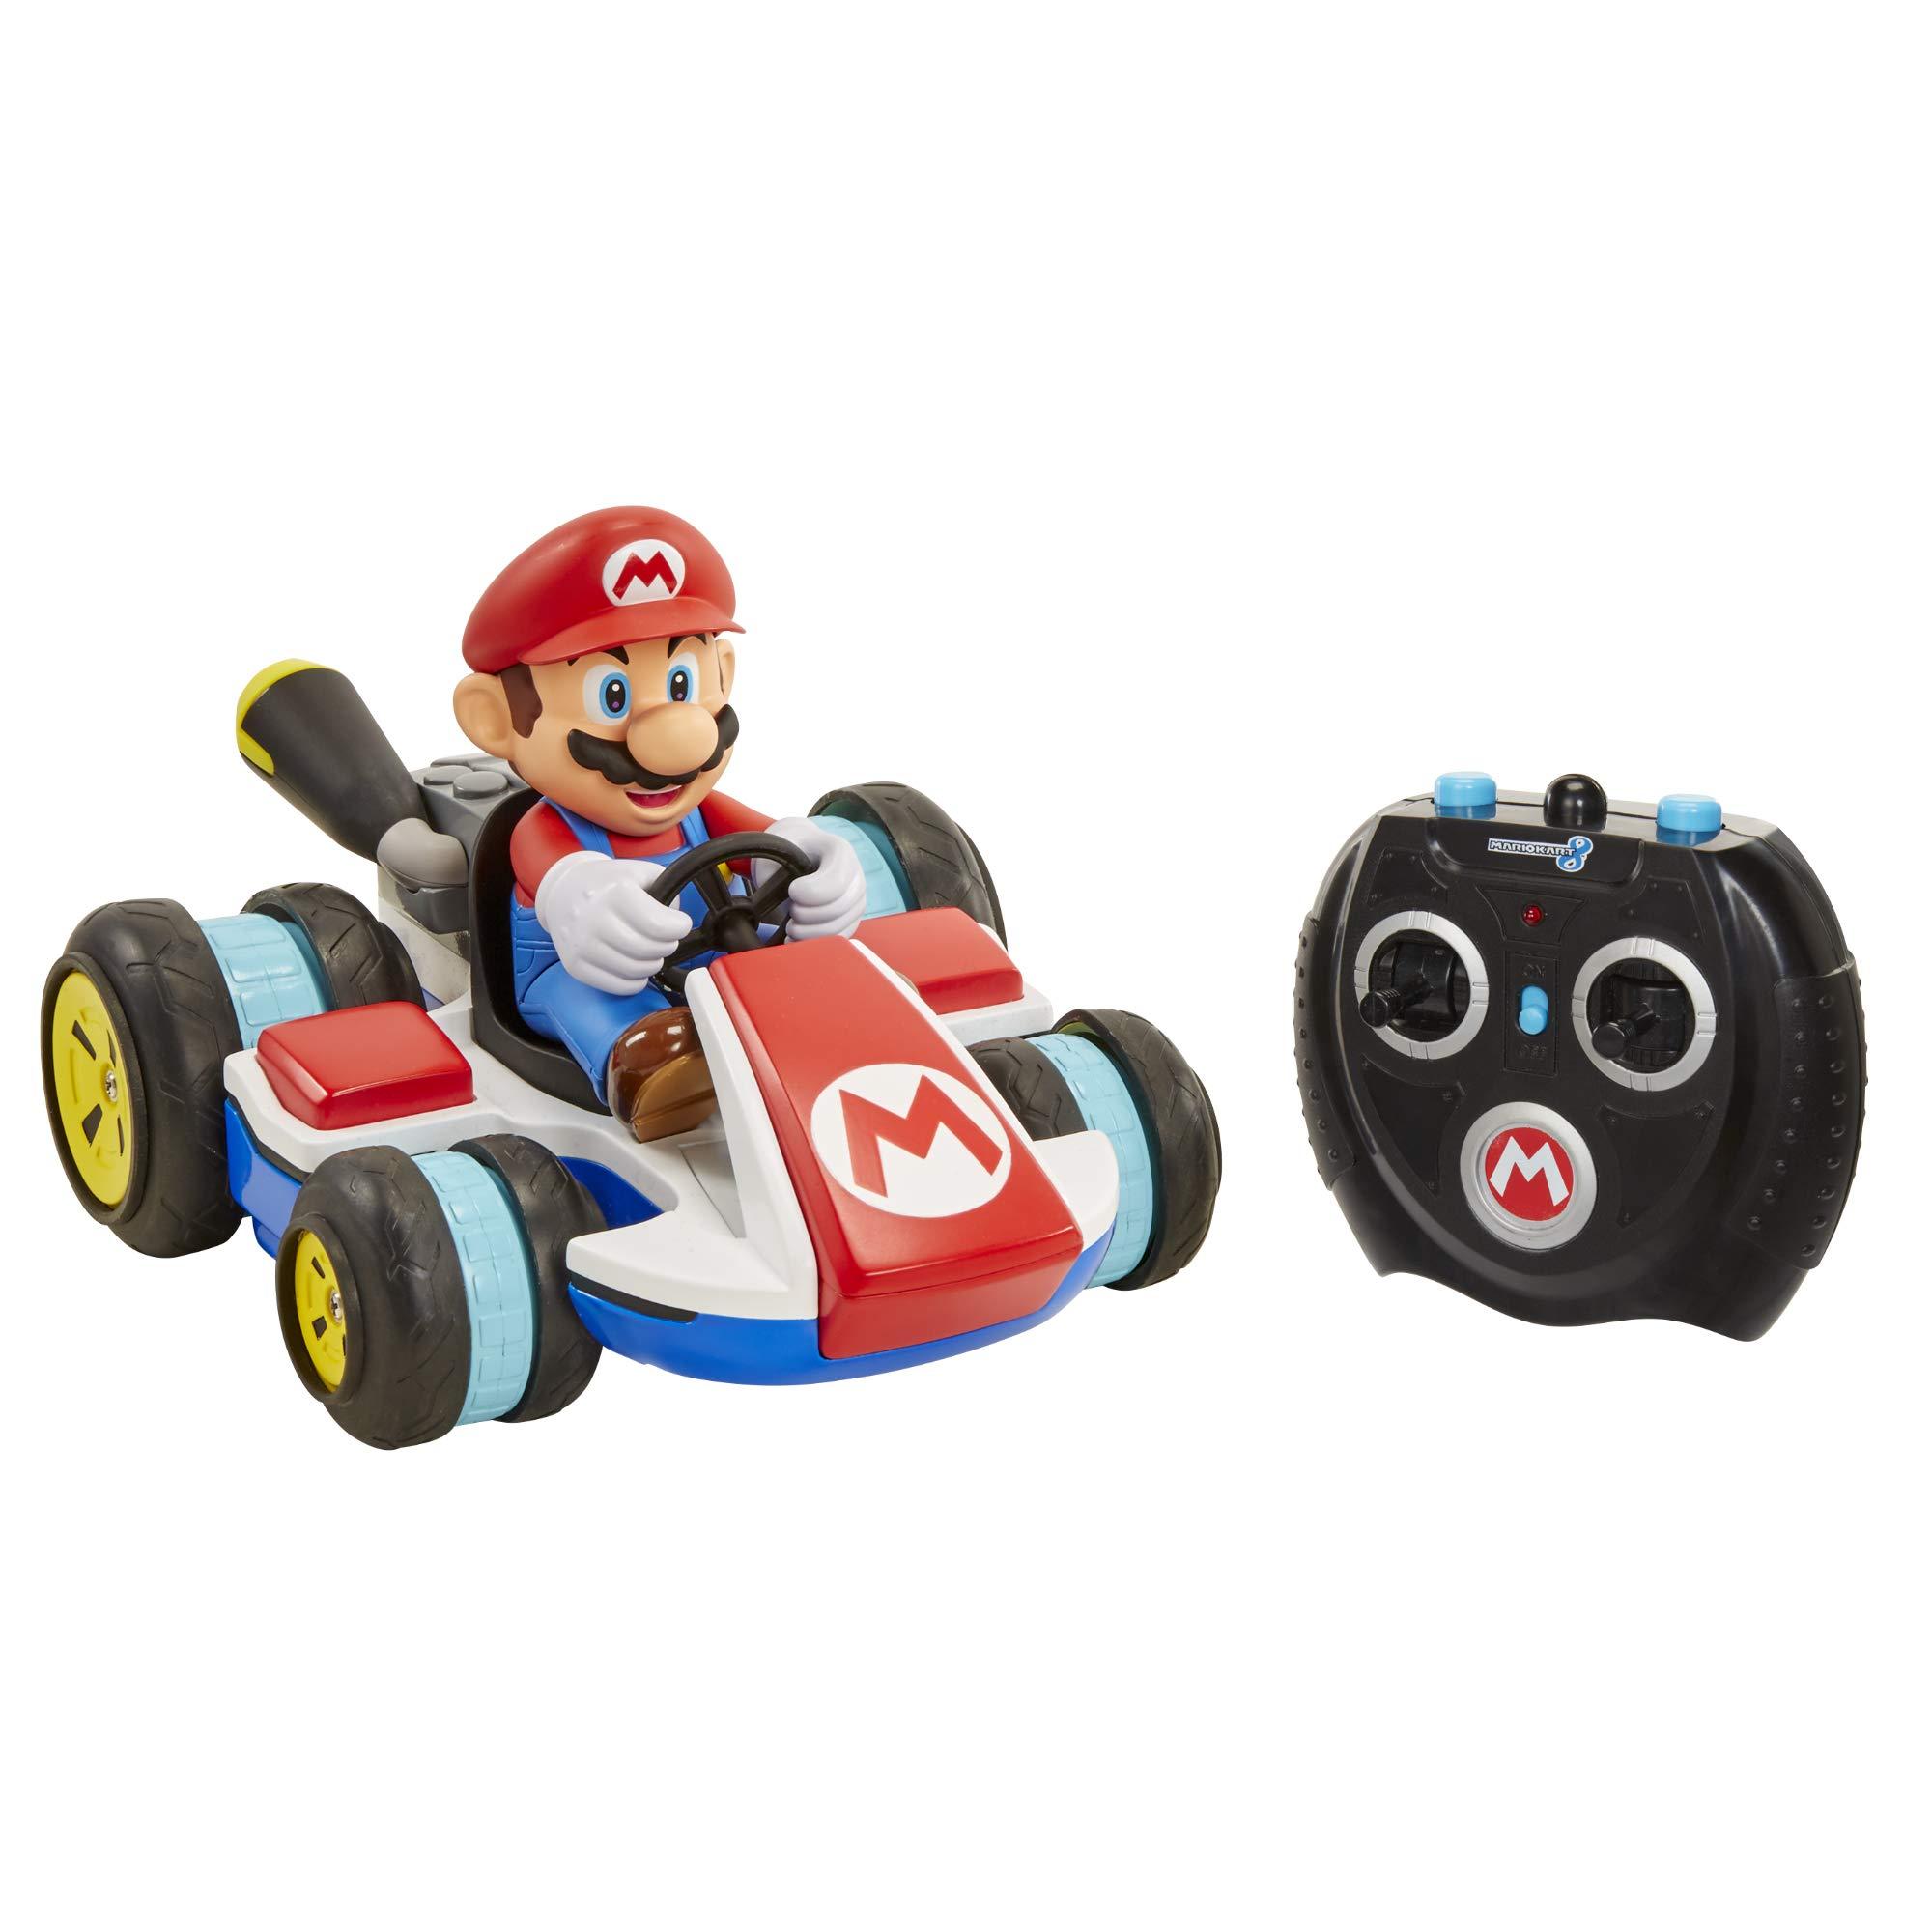 NINTENDO Super Mario Kart 8 Mario Anti-Gravity Mini RC Racer 2.4Ghz by Nintendo